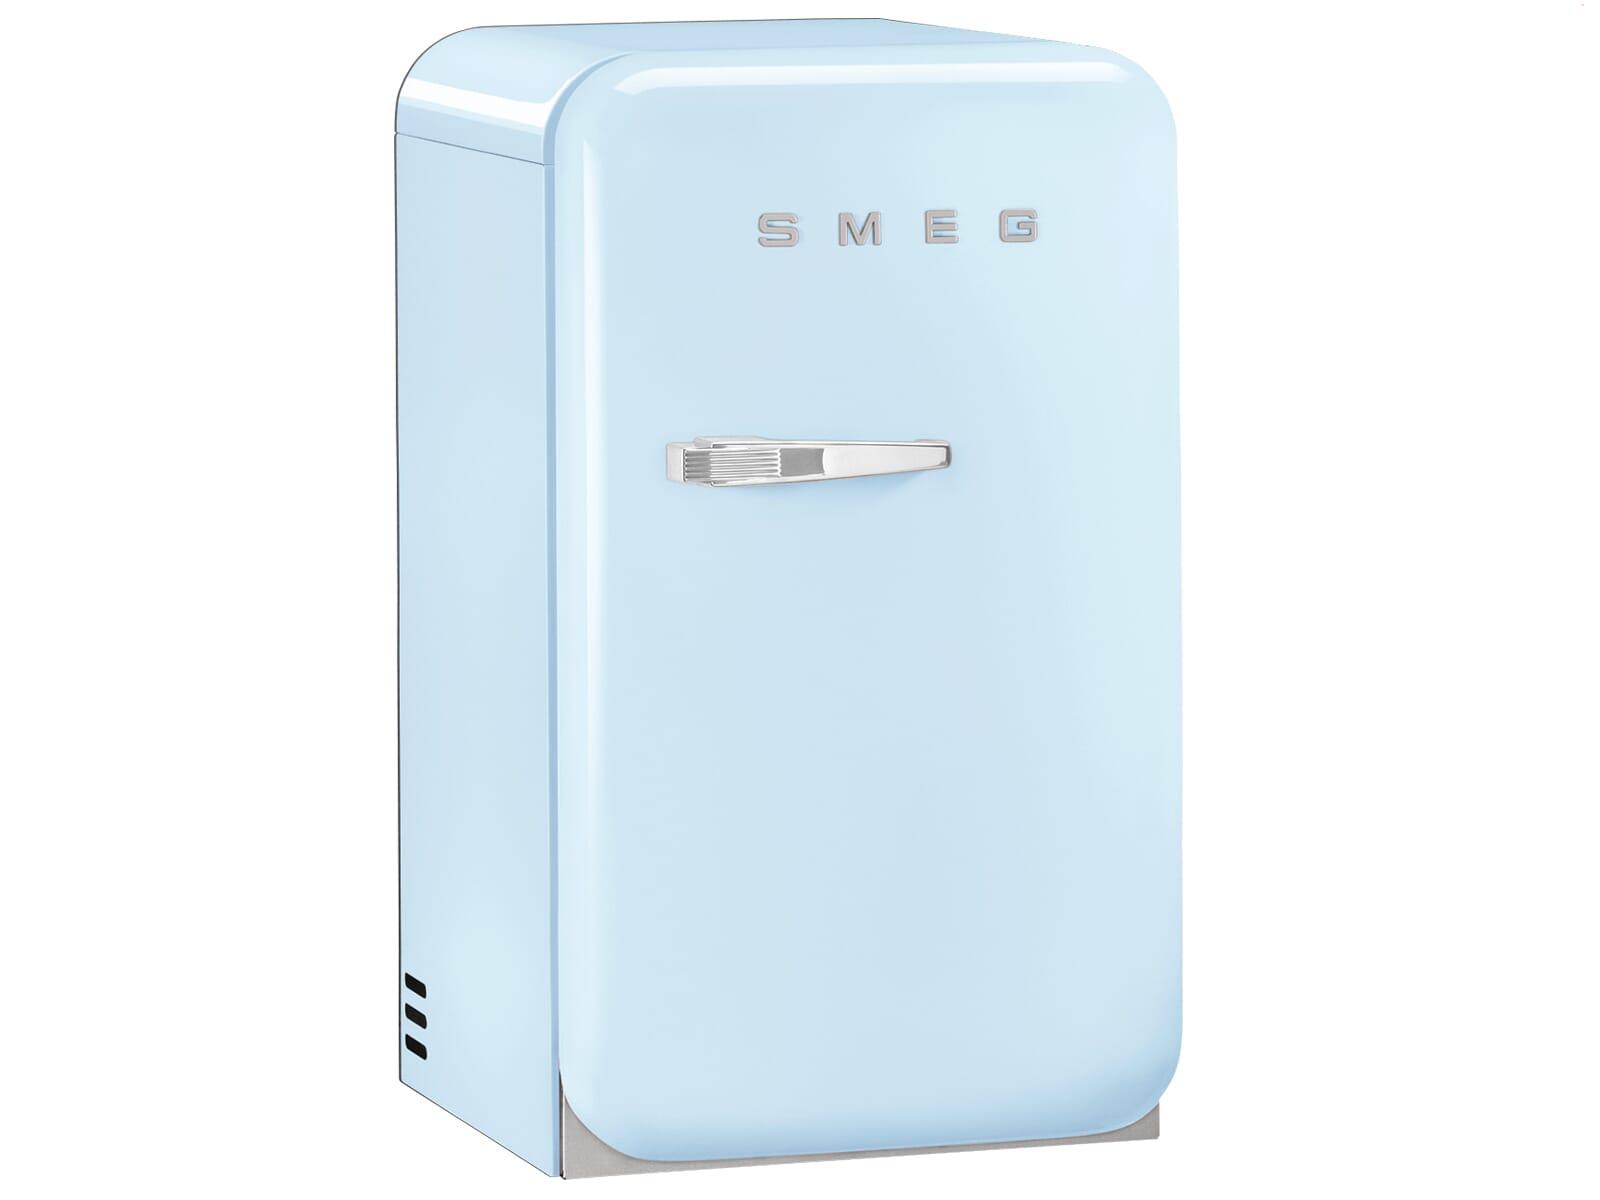 Smeg Kühlschrank Blau : Smeg fab5rpb stand flaschenkühlschrank pastellblau